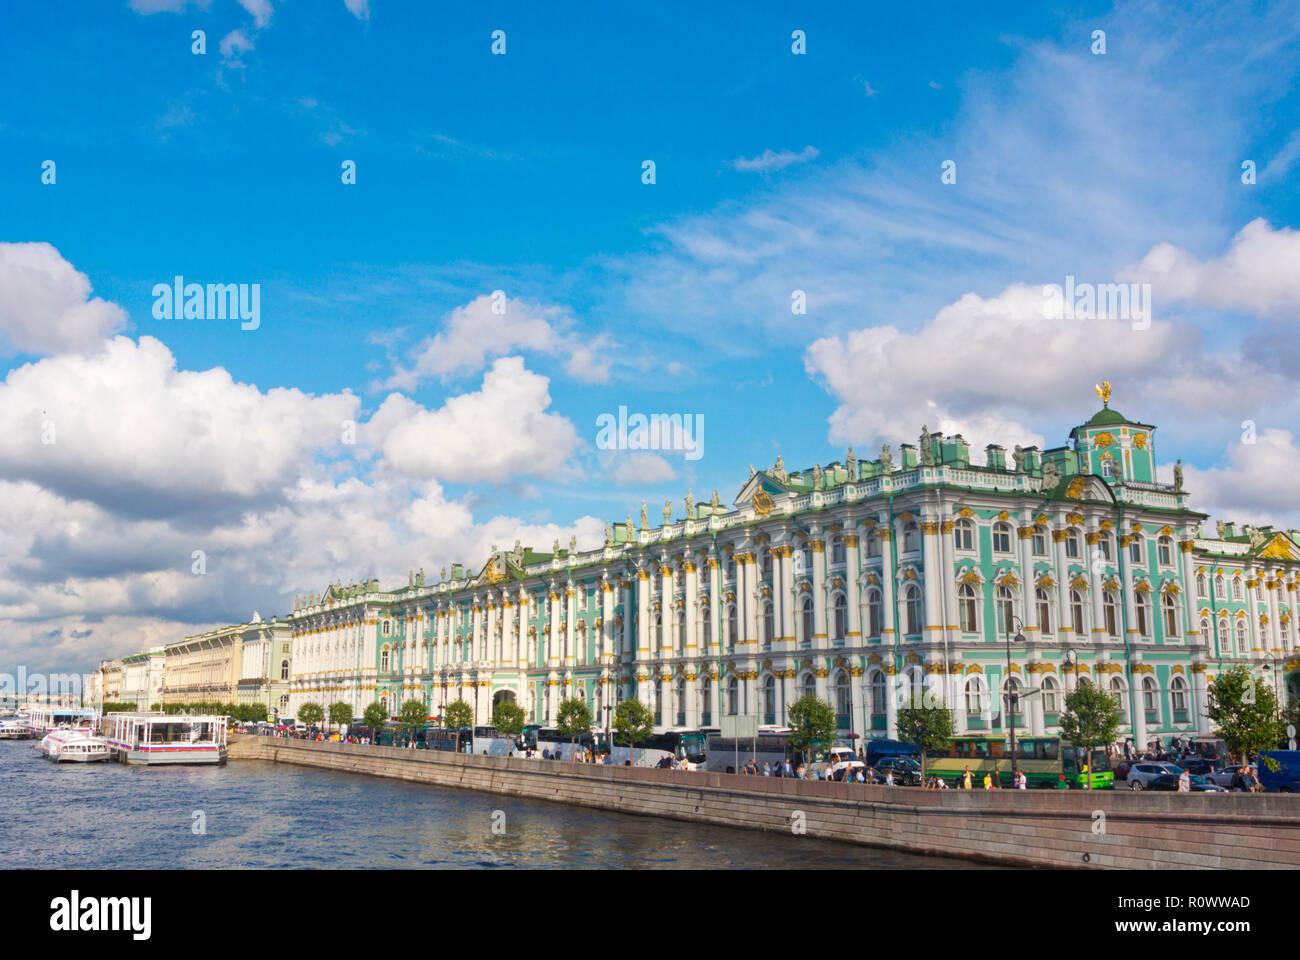 Palace Embankment, with Winter Palace, Saint Petersburg, Russia - Stock Image